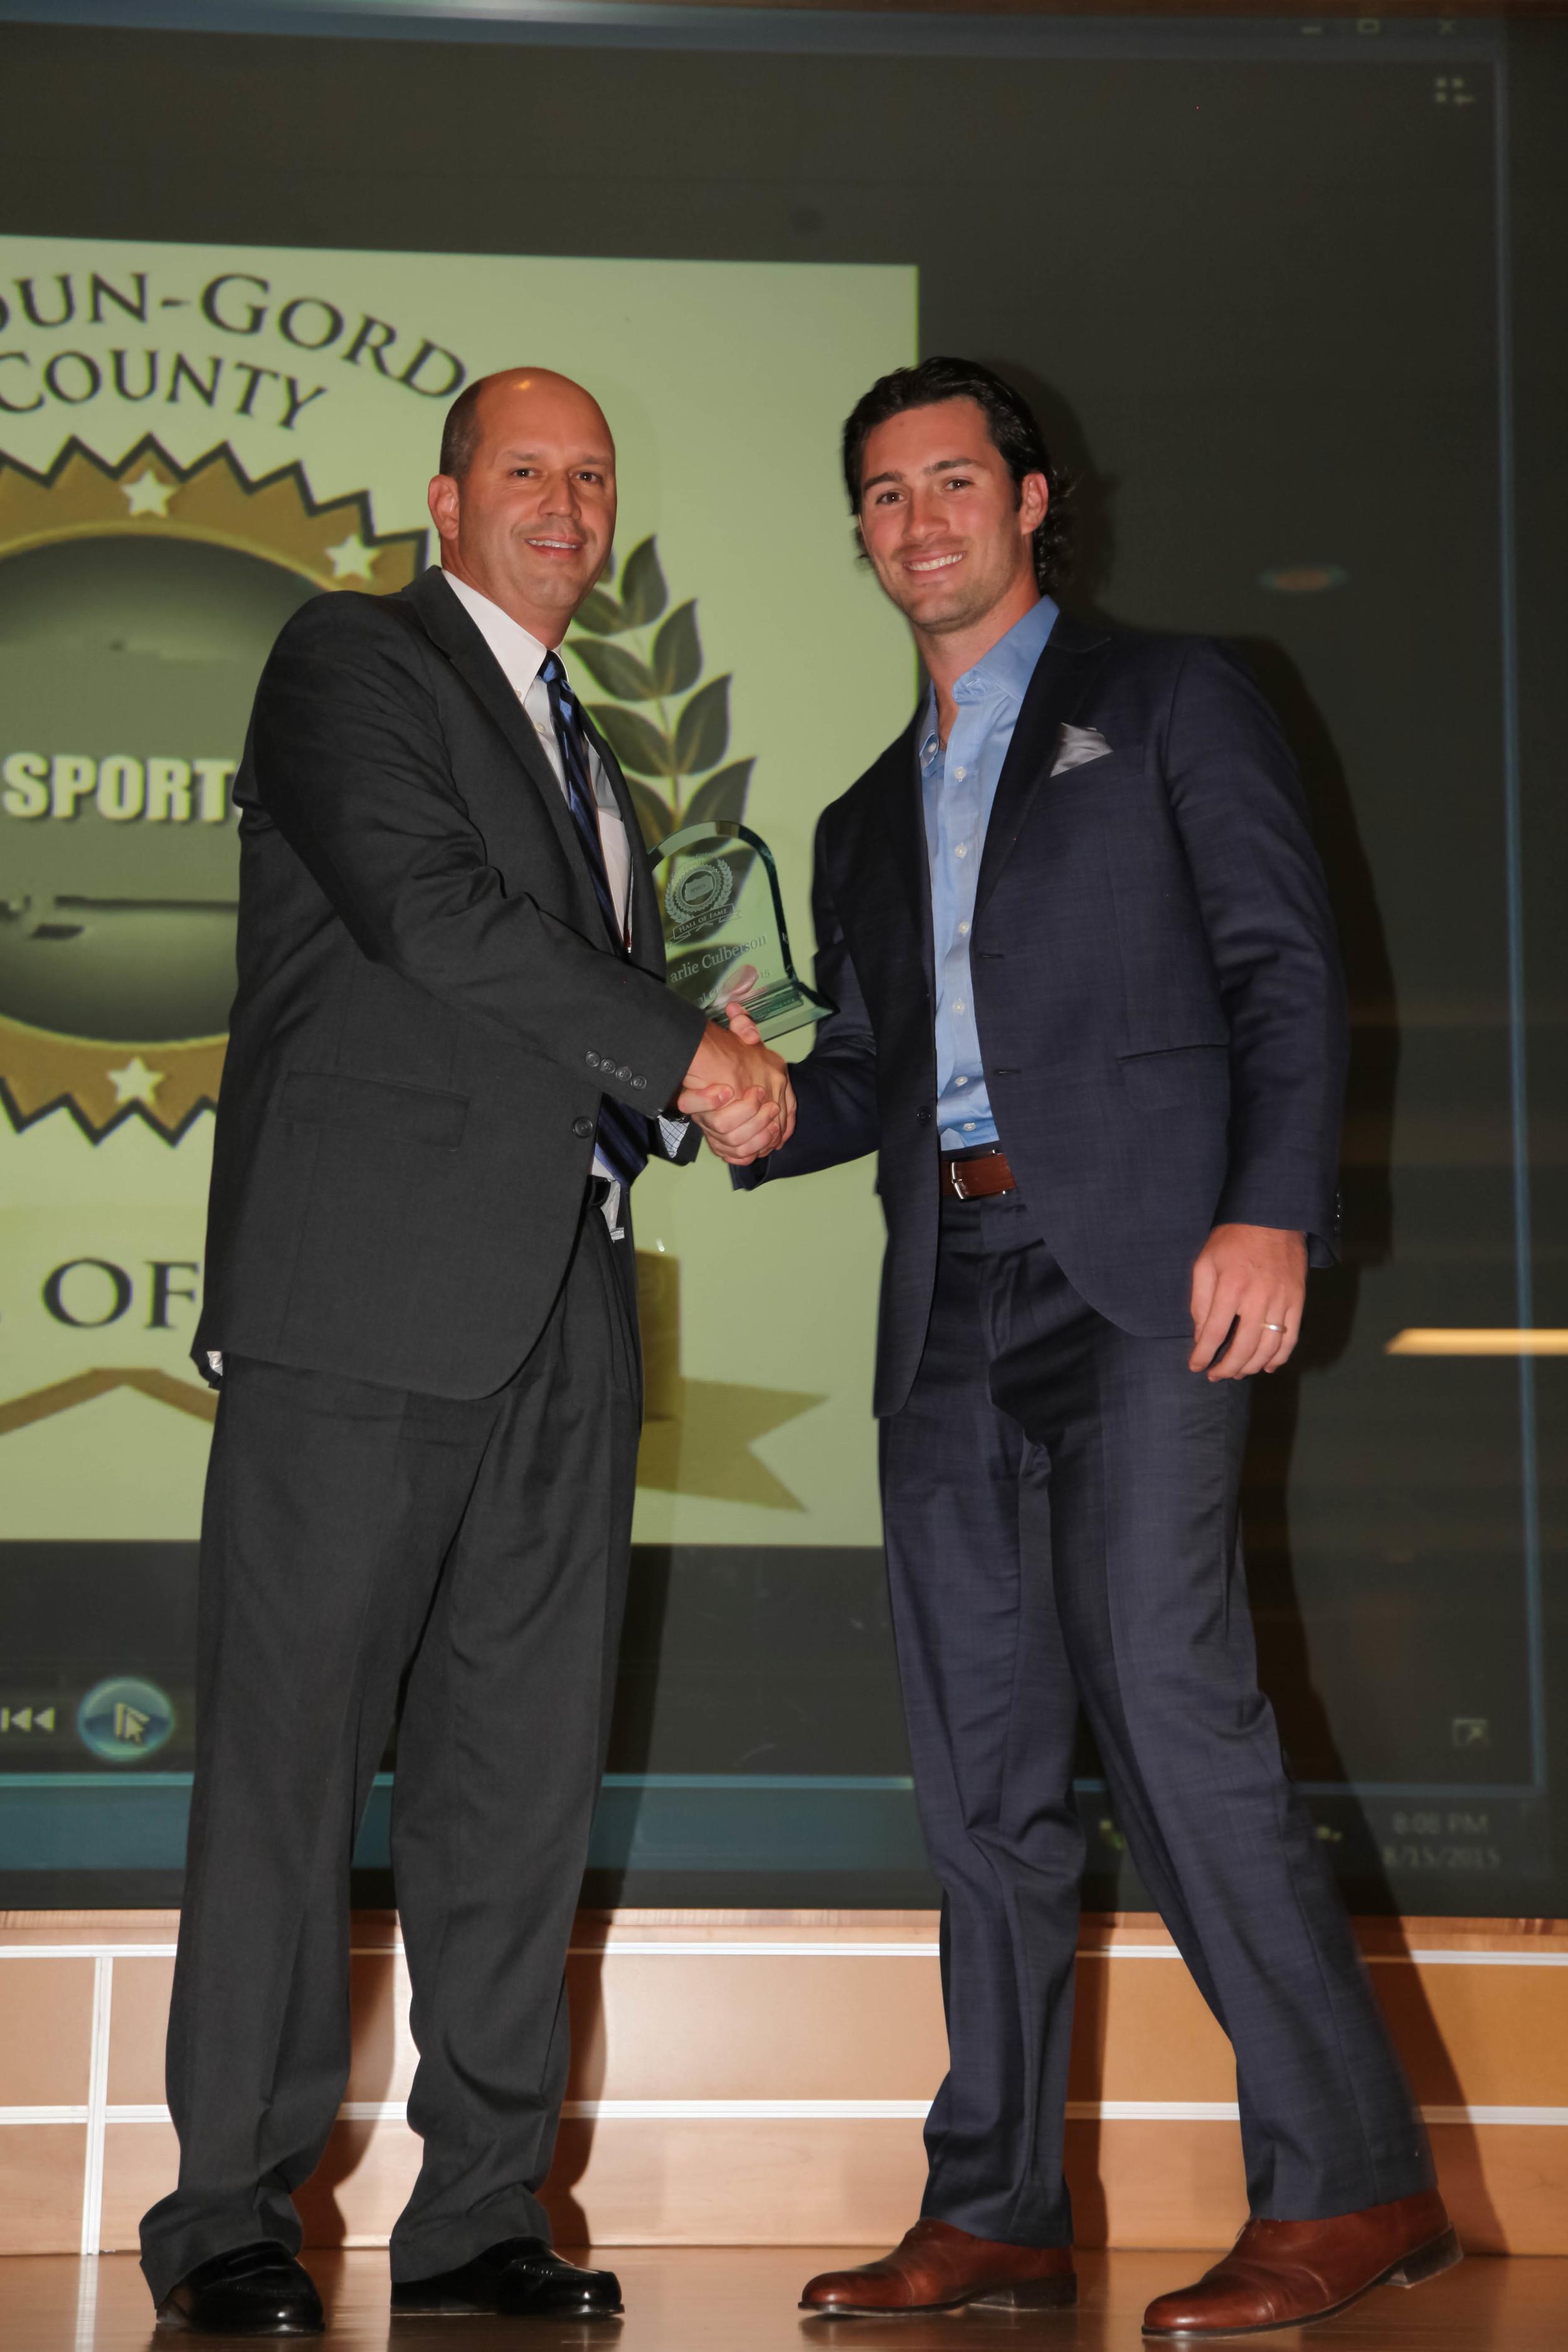 Calhoun-Gordon-County-Sports-Hall-of-Fame-2015-054.jpg